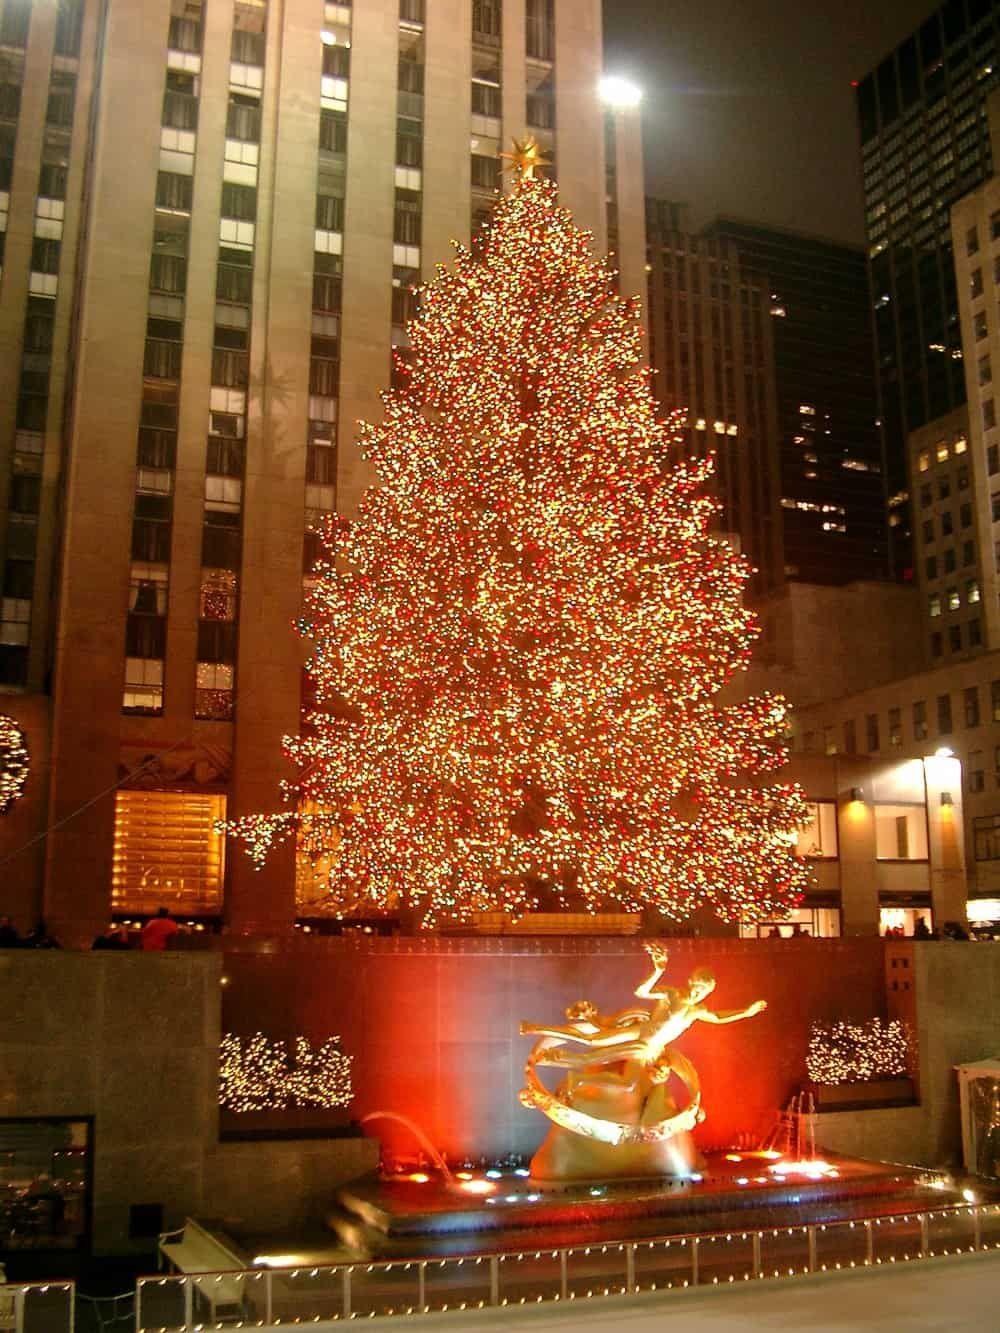 #rockefellercentre #christmastree #NewYork #NYC #christmasinnewyork The Big Apple: Golden, Delicious, but never Spartan.